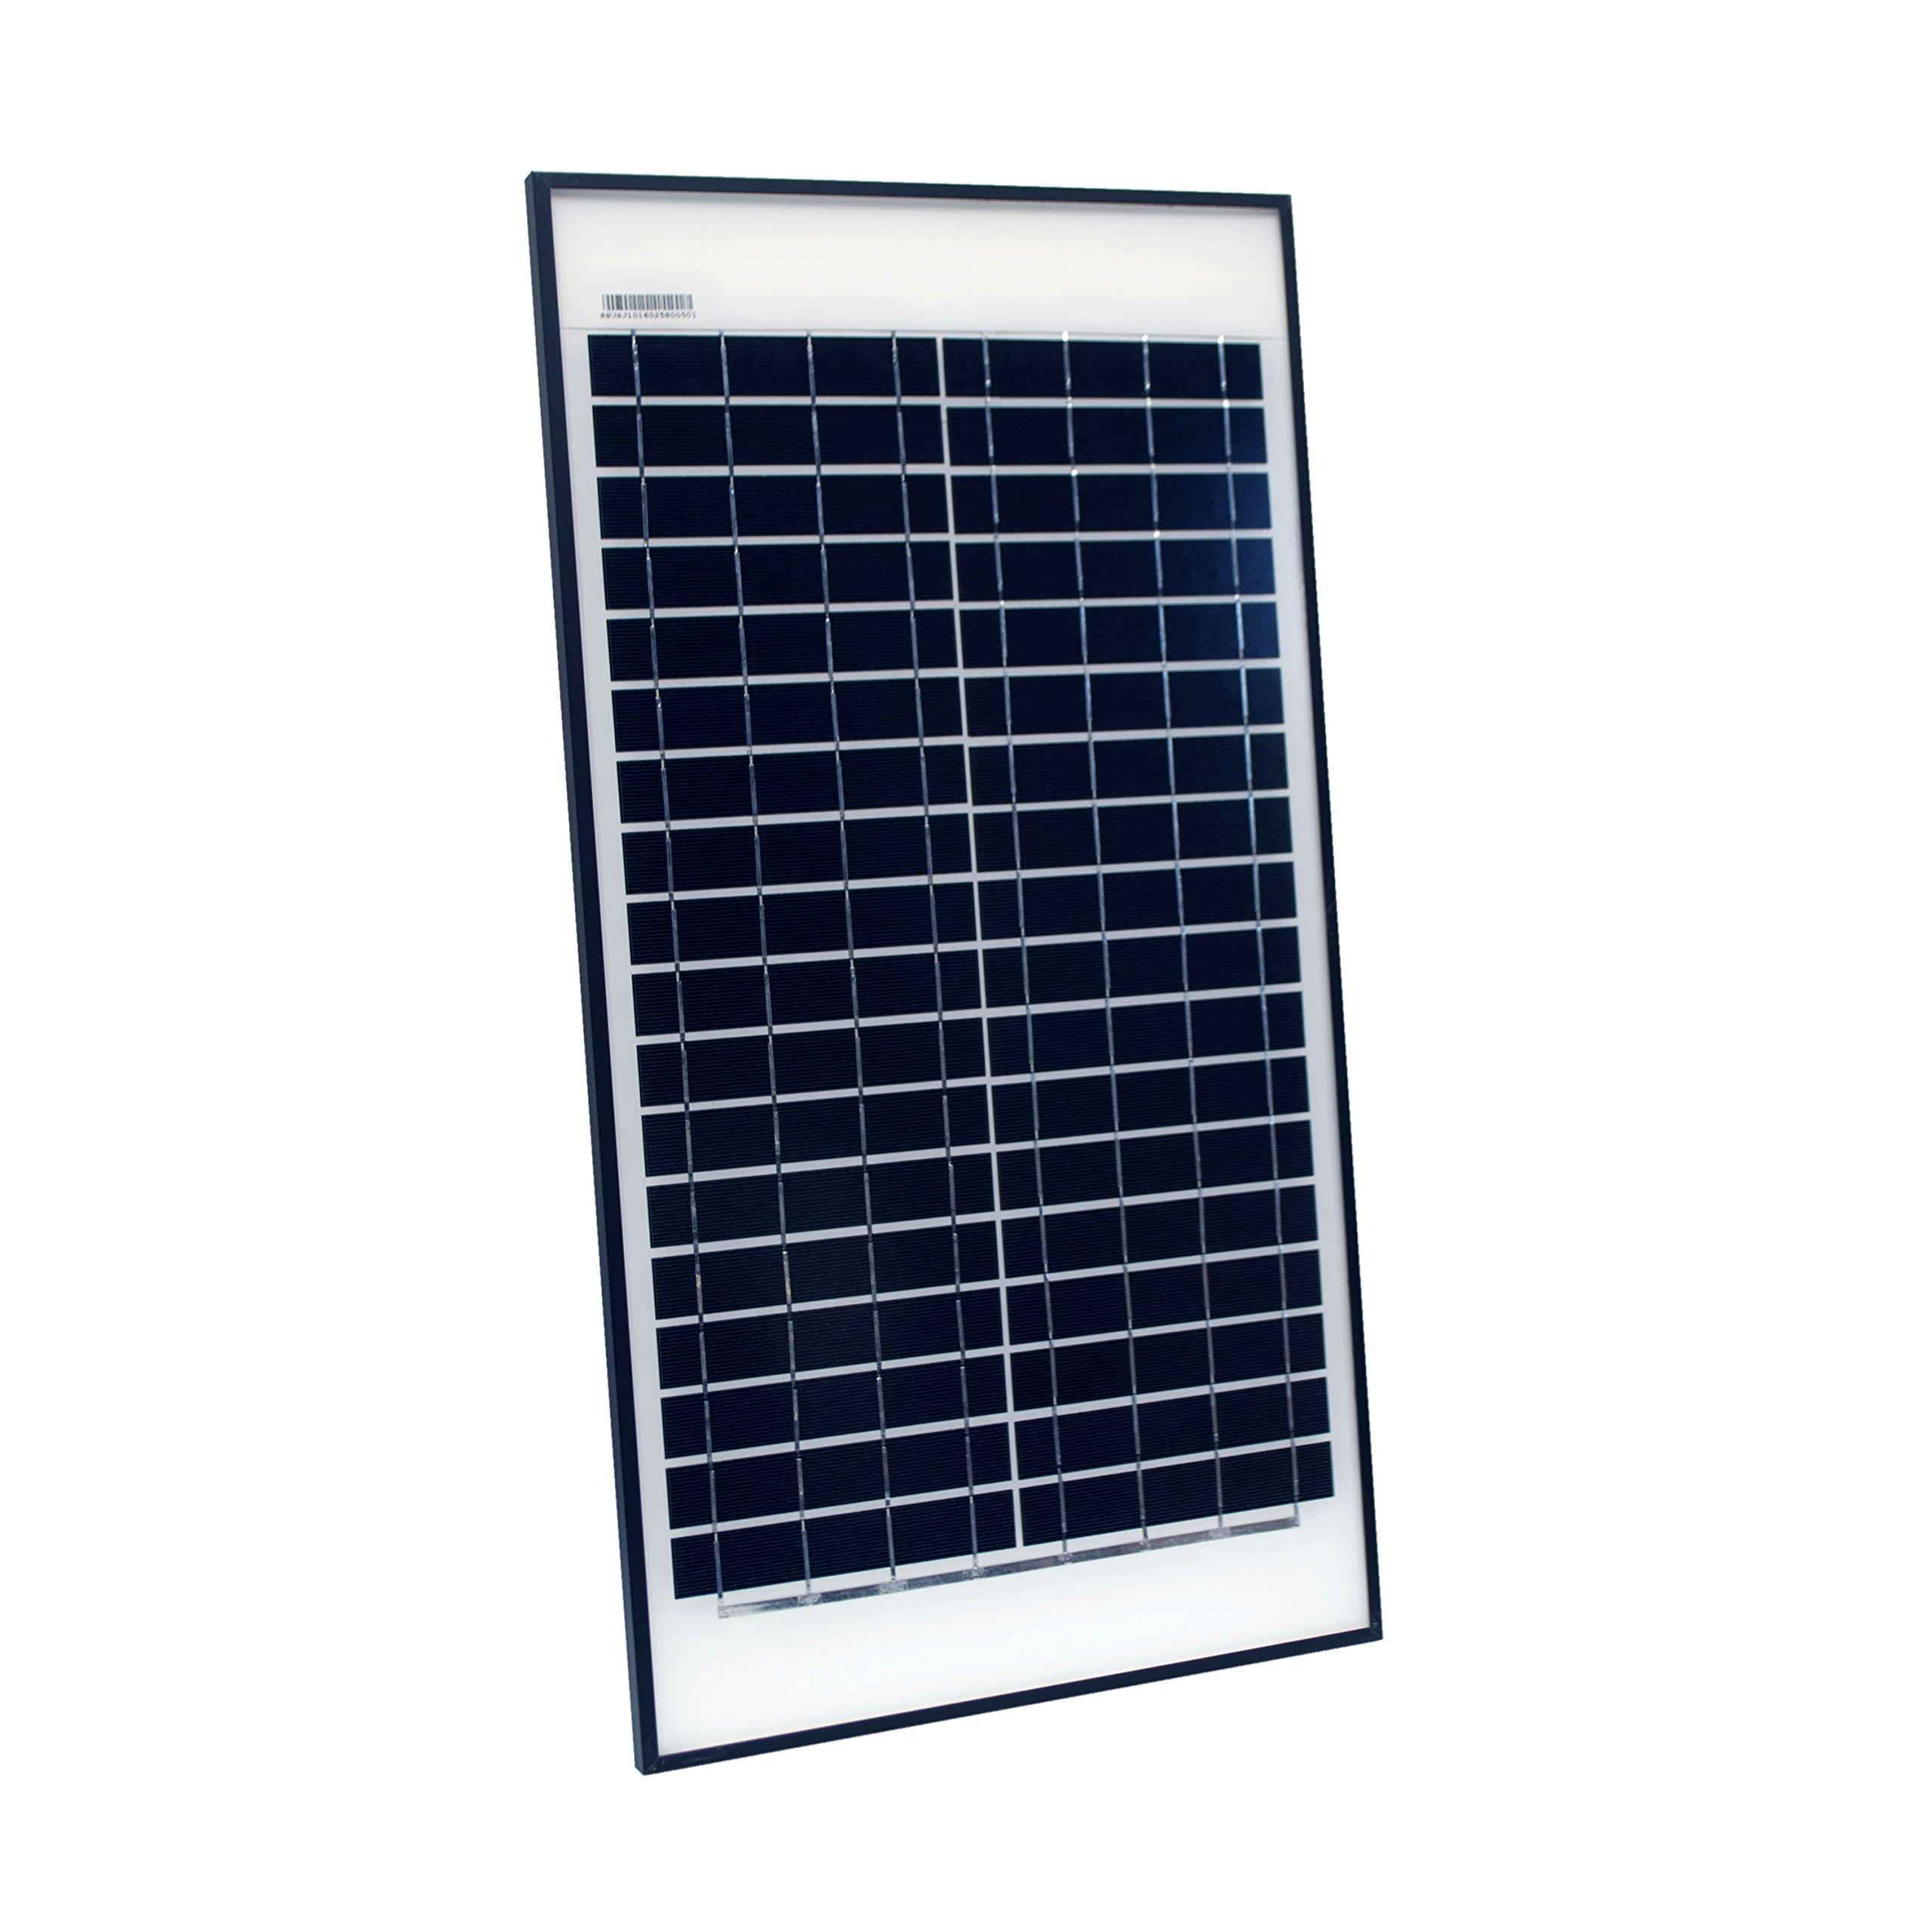 ALEKO SPU25W12V 25 Watt 12 Volt Monocrystalline Solar Panel for Gate Opener Pool Garden Driveway